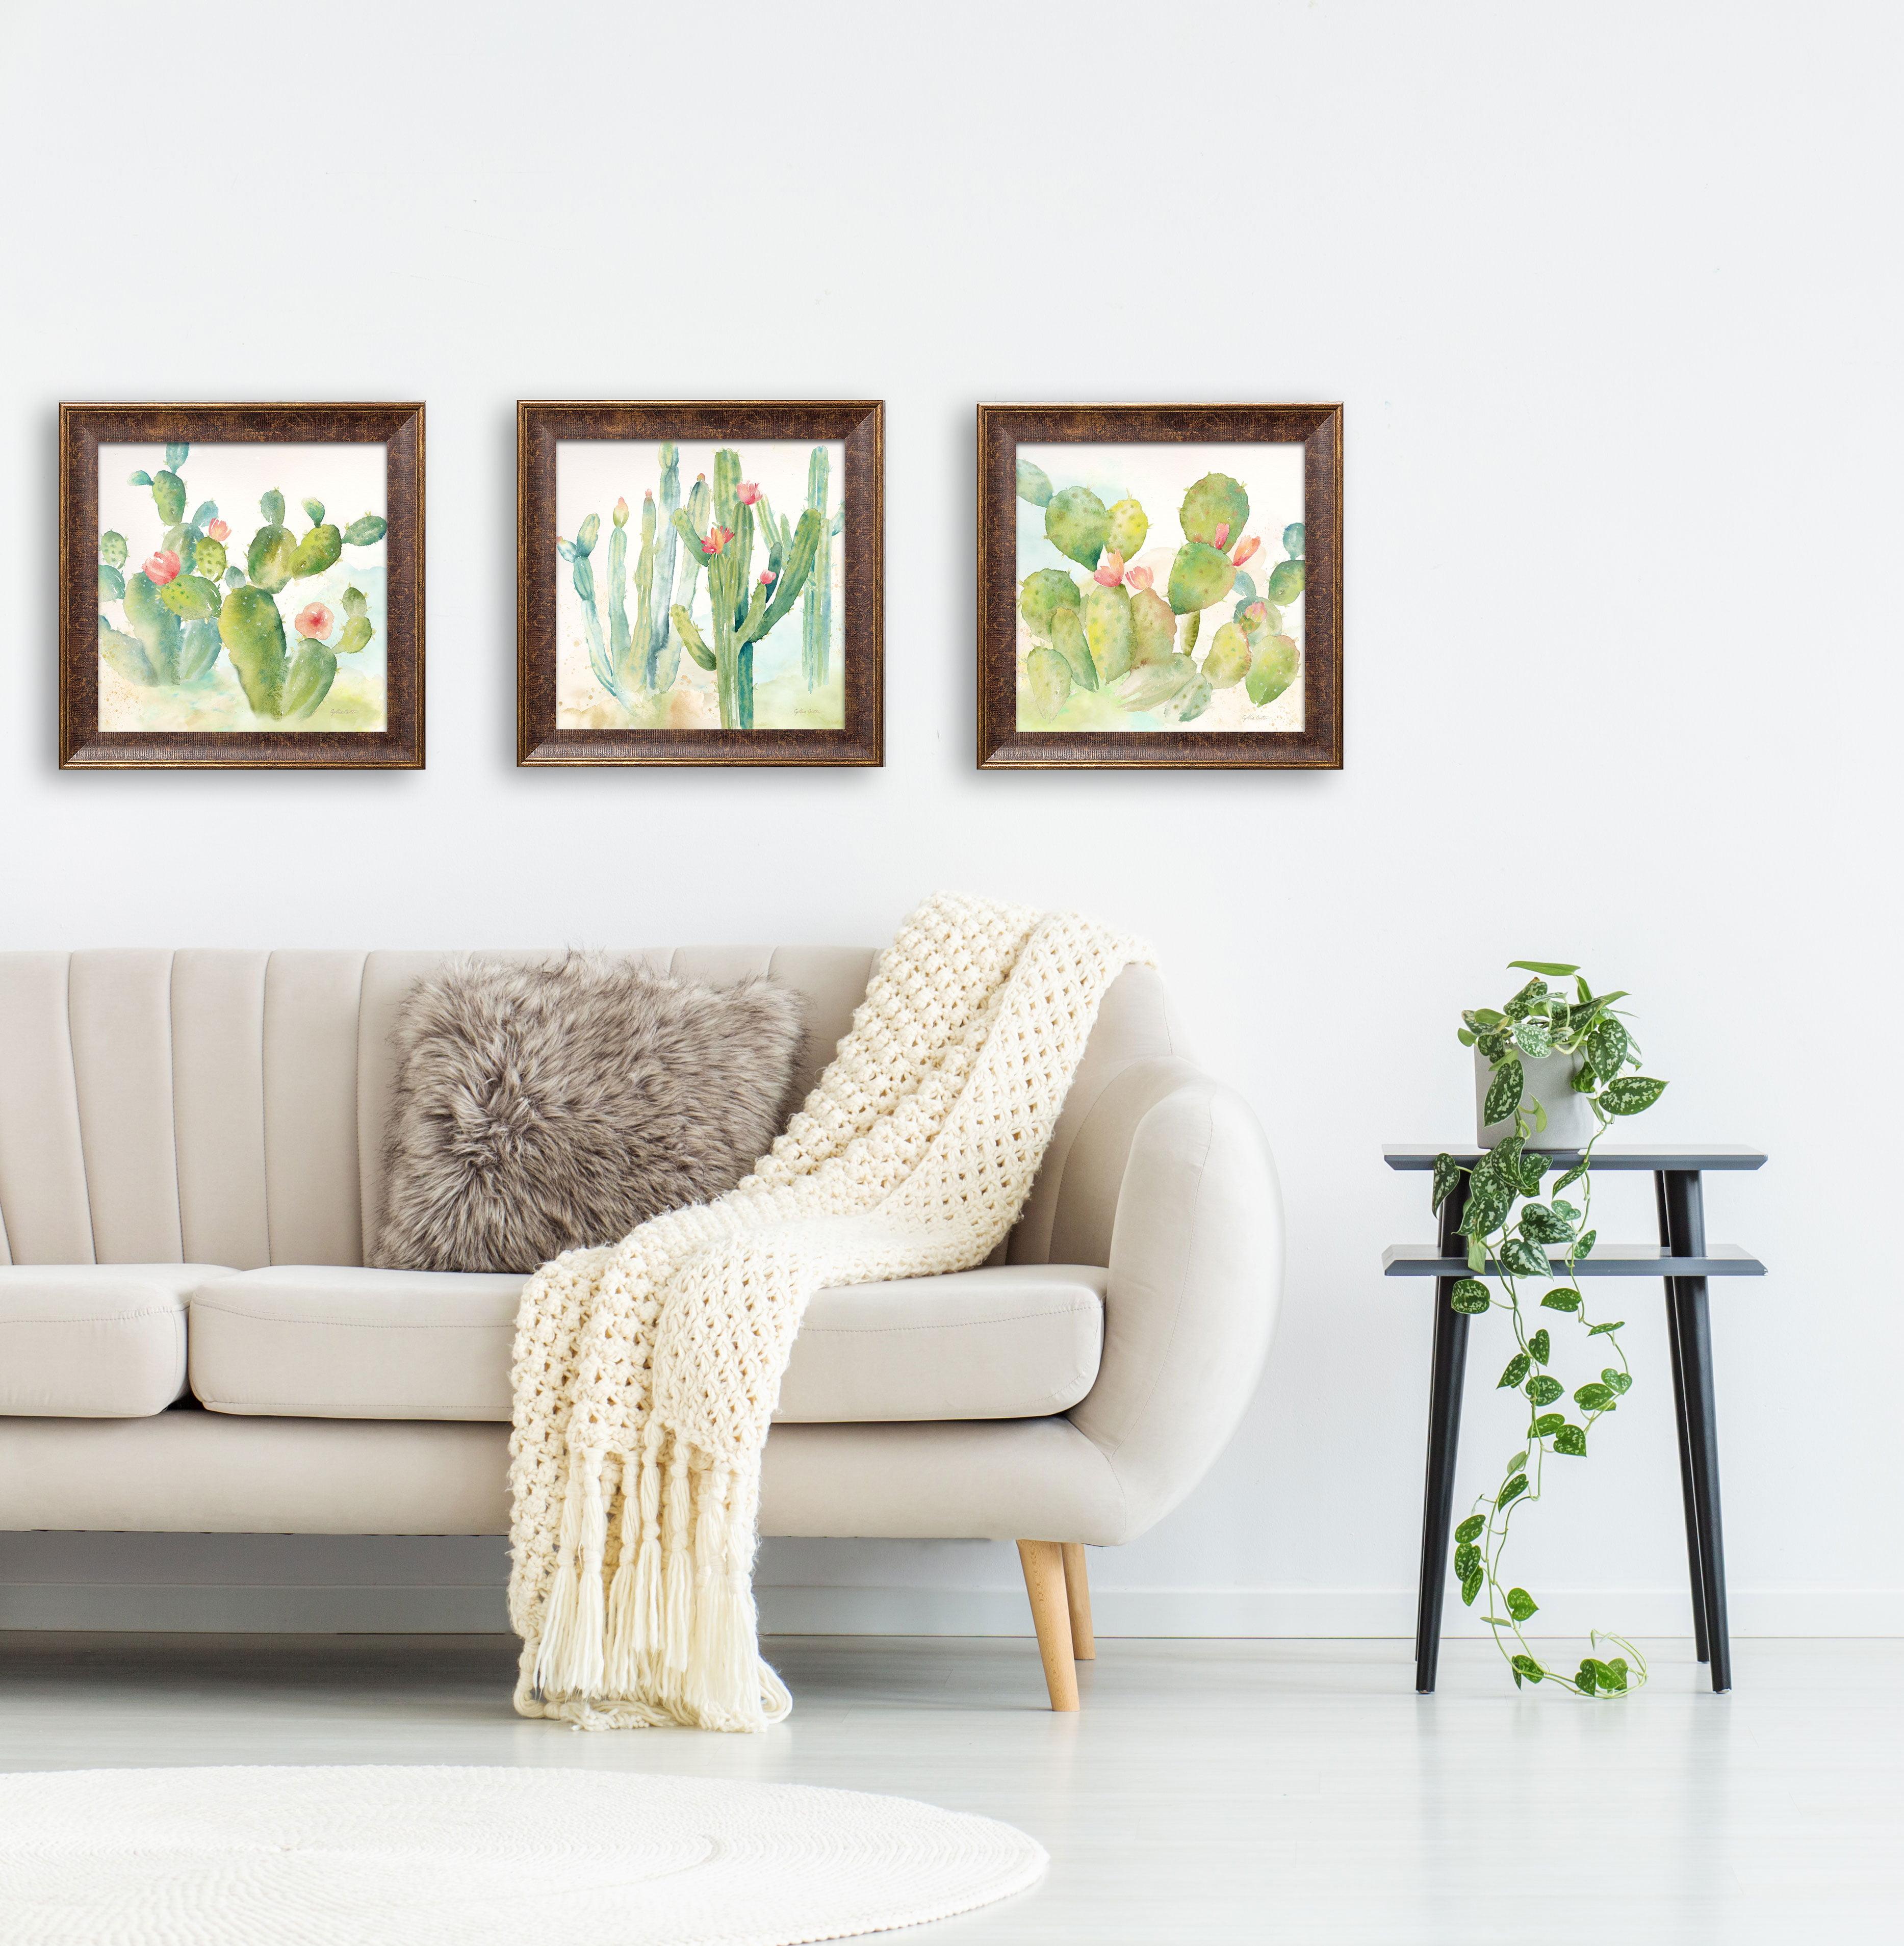 Travel Tourism Mexico Cactus Desert Sun Village 12X16 Inch Framed Art Print